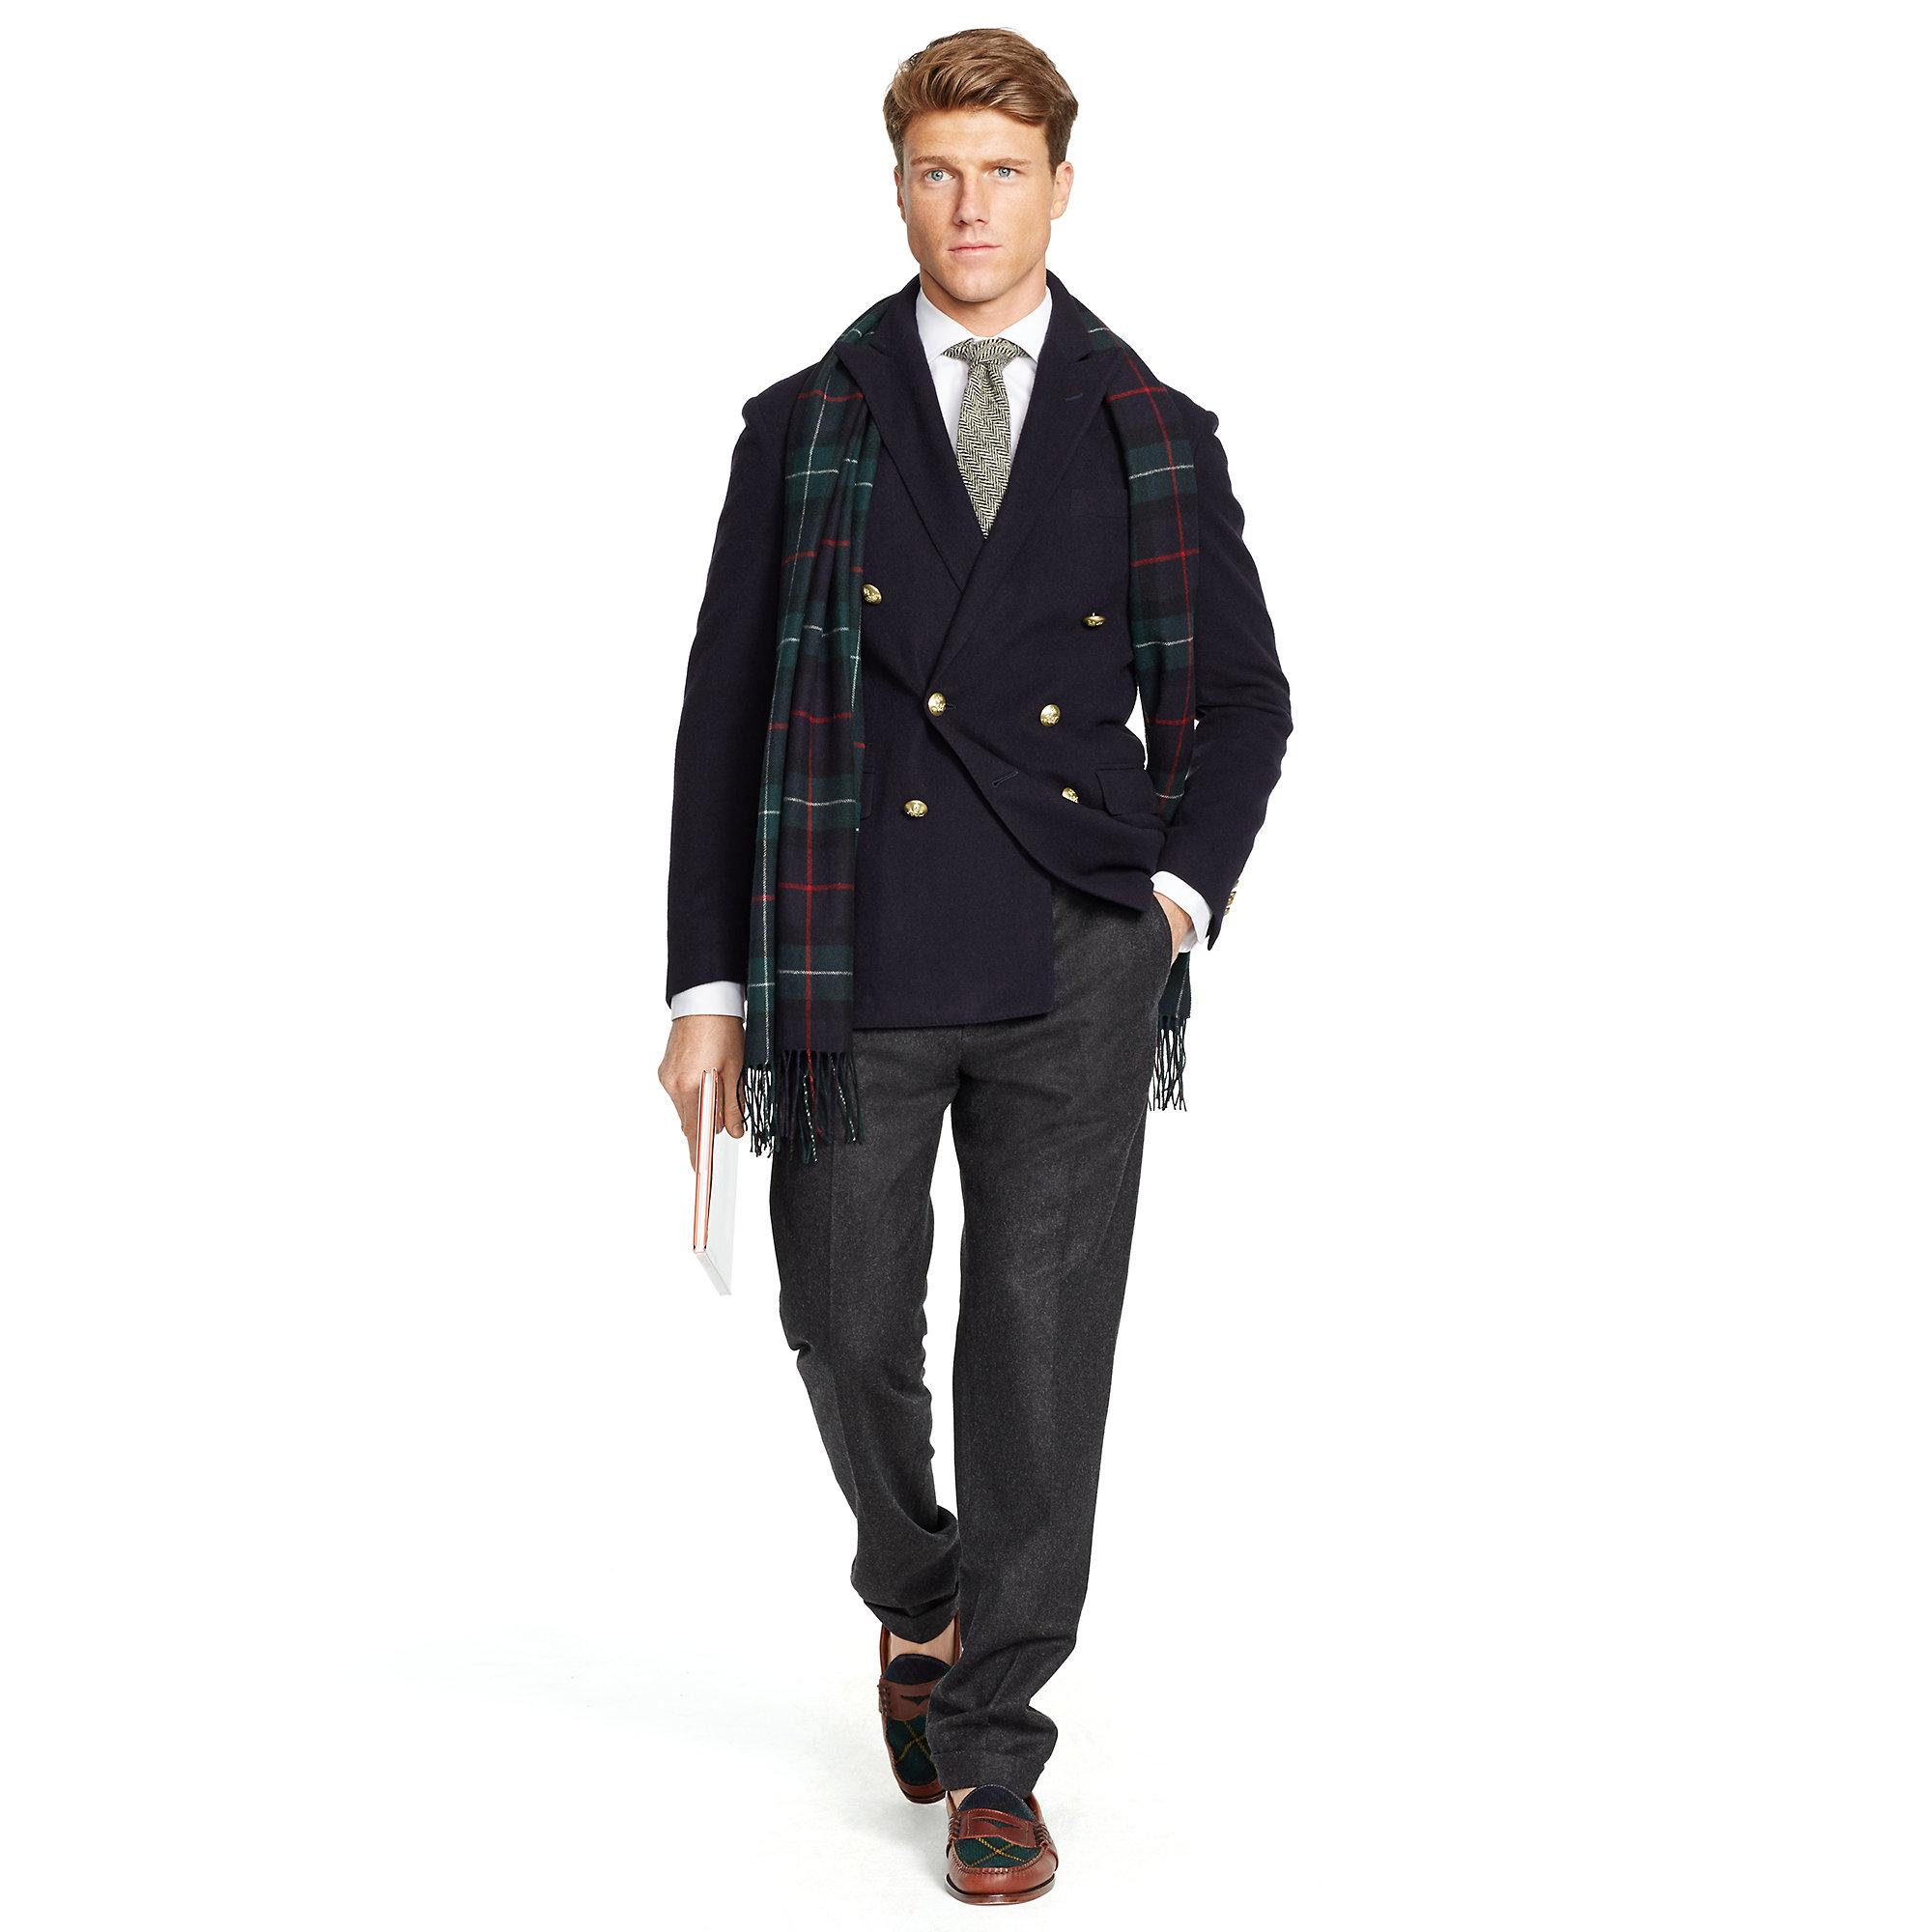 b024afb8e35 Lyst - Polo Ralph Lauren Morgan Cashmere Db Sport Coat in Blue for Men